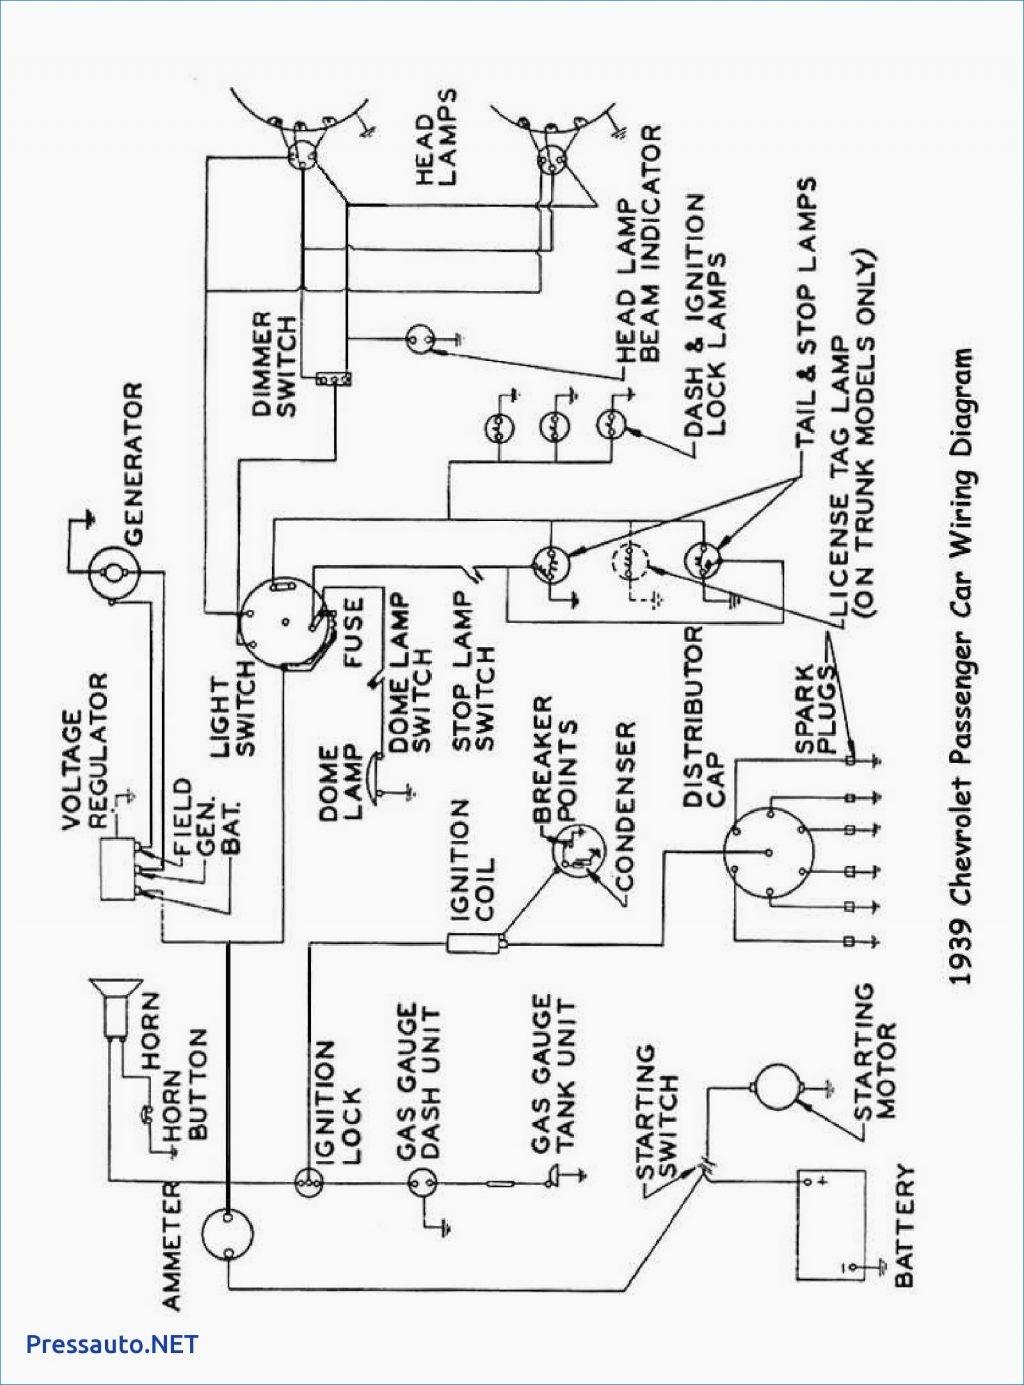 Diagram leviton way switch wiring decora dimmer uk with